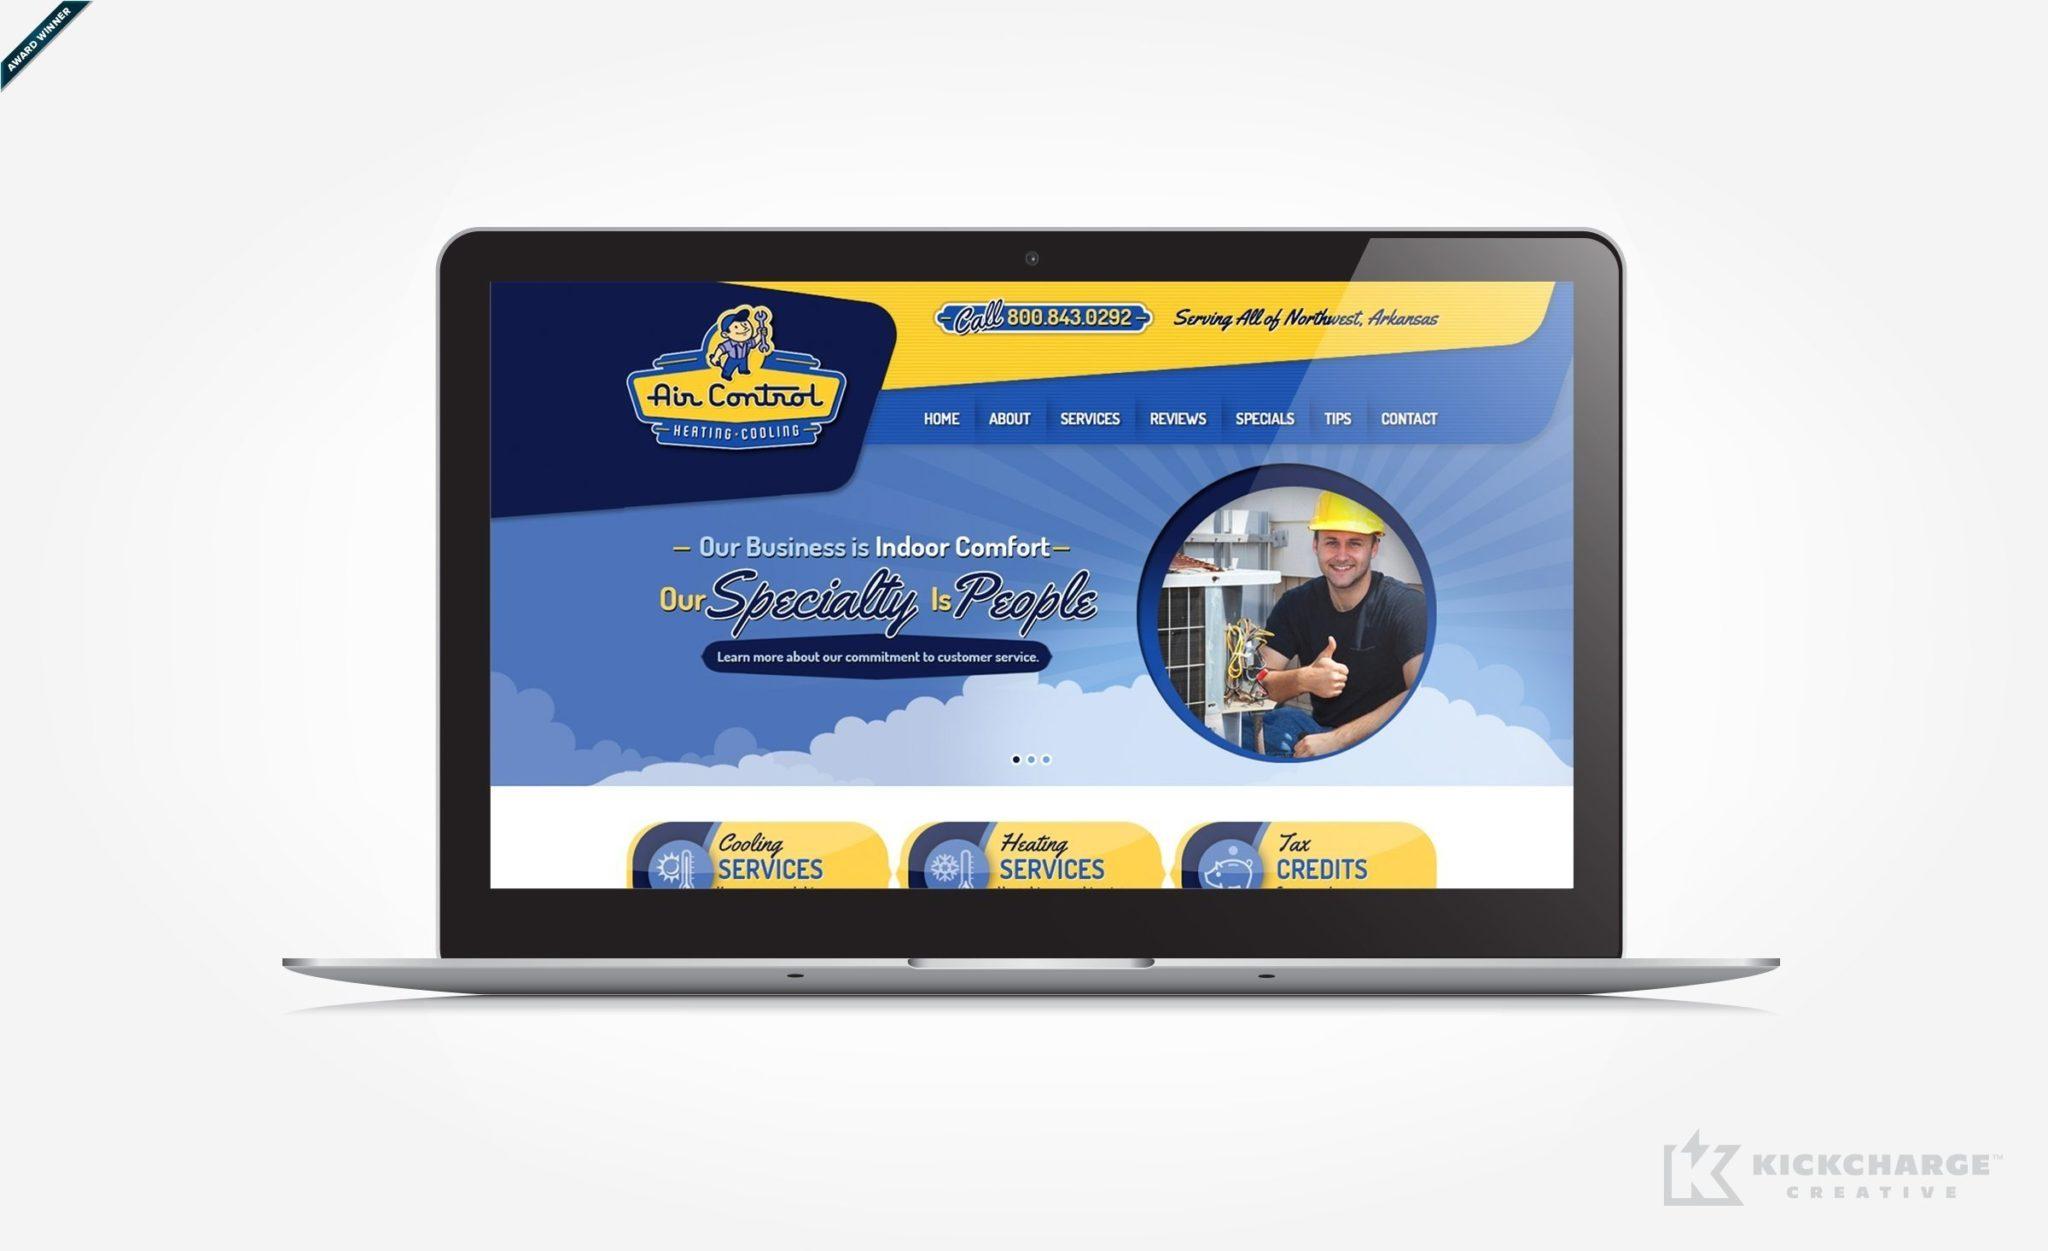 Web design for a HVAC contractor located in Springdale, AR. Award winning design - Graphic Design USA 2014 American Web Design Awards.